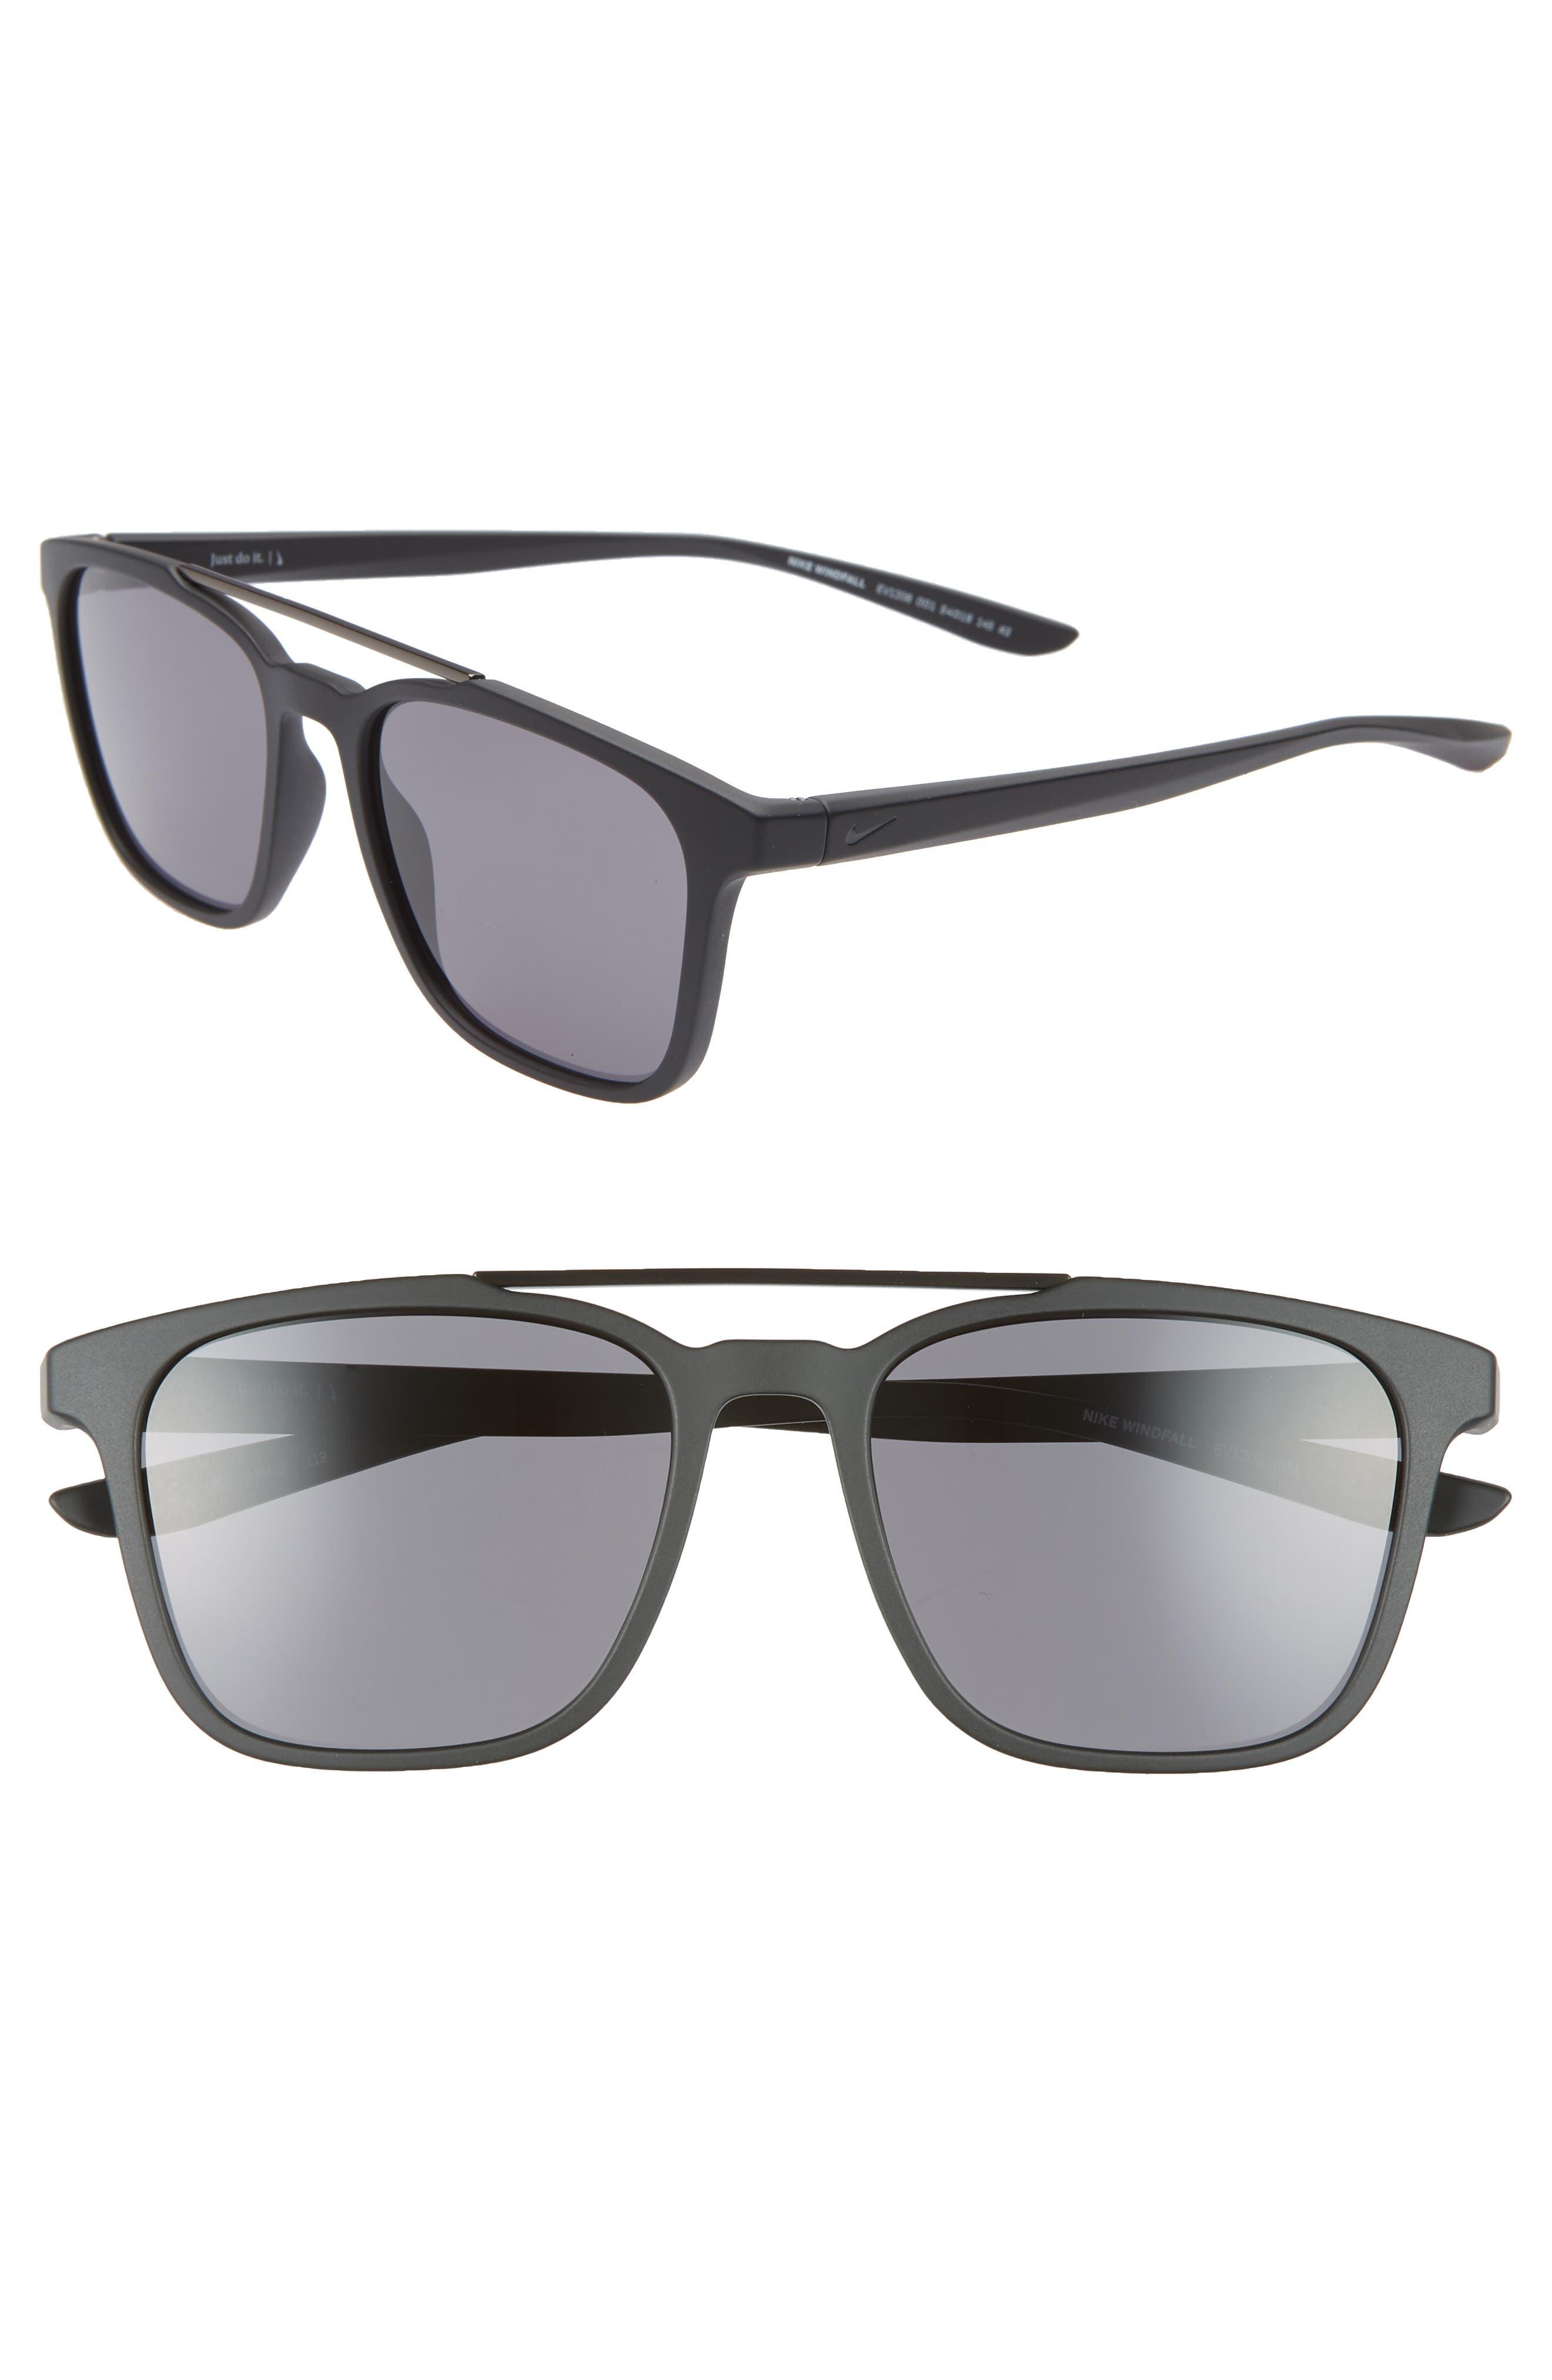 Nike Windfall 5m Square Sunglasses - Matte Black/ Dark Grey